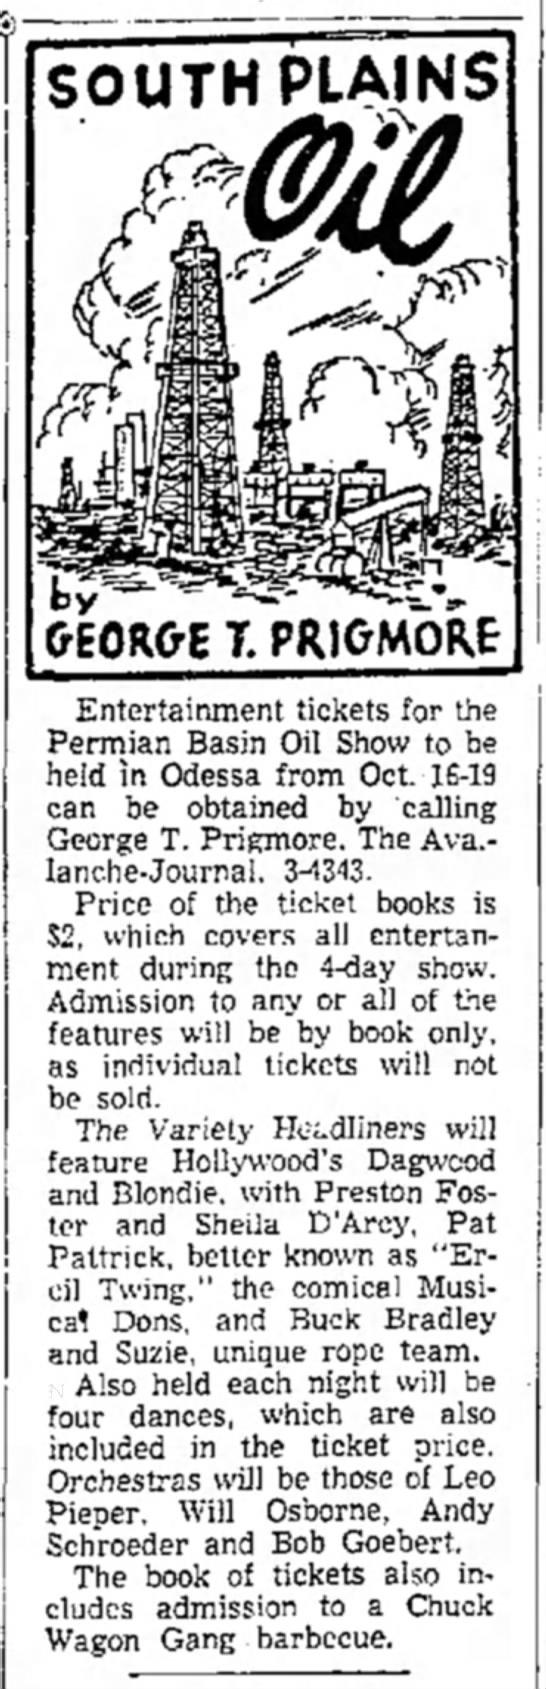 - I SOUTH PLAINS GEORGE T. PRICMOftf...